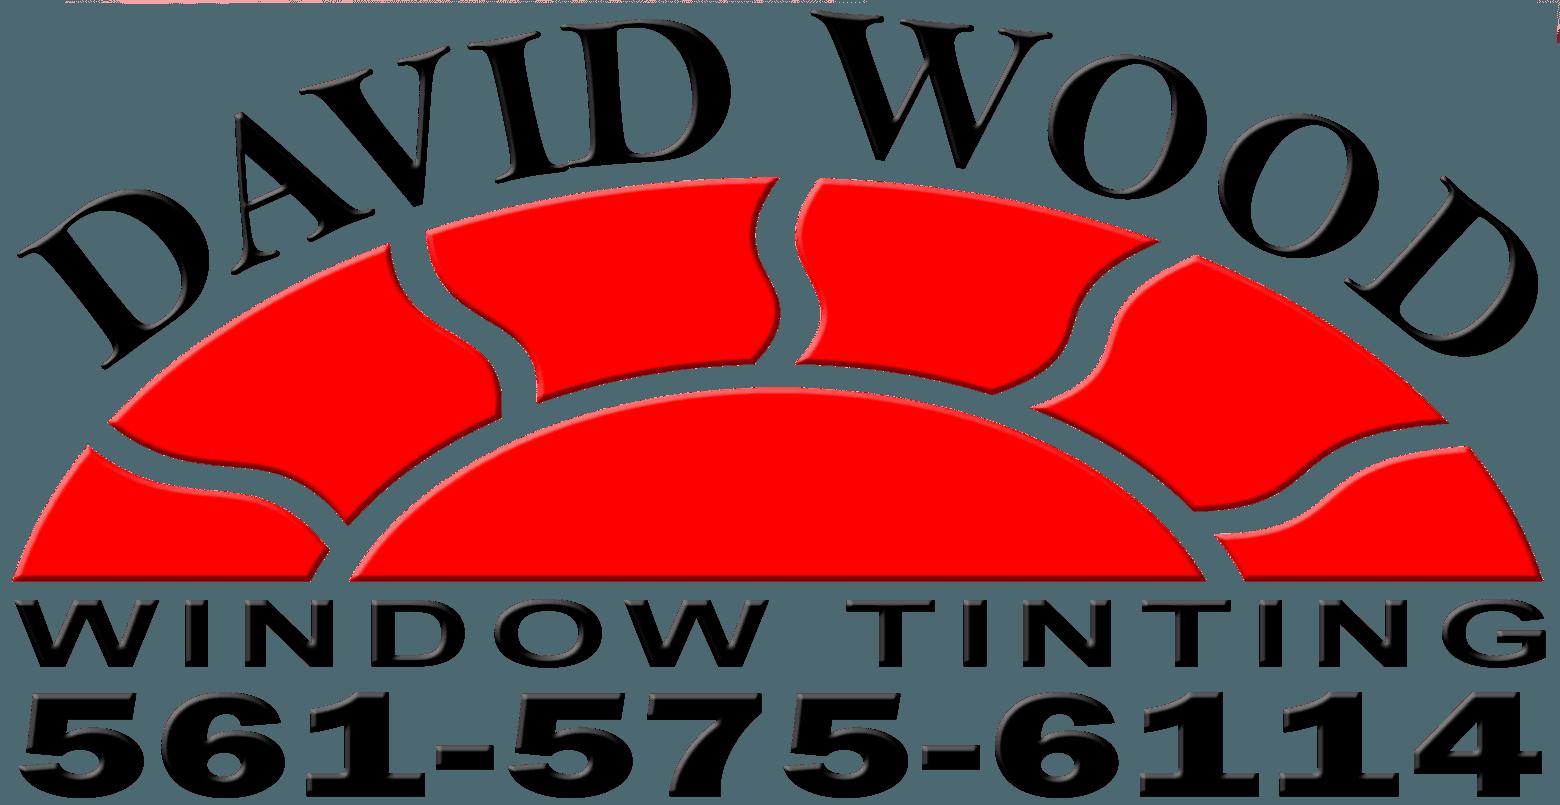 David Wood Window Tinting For Auto